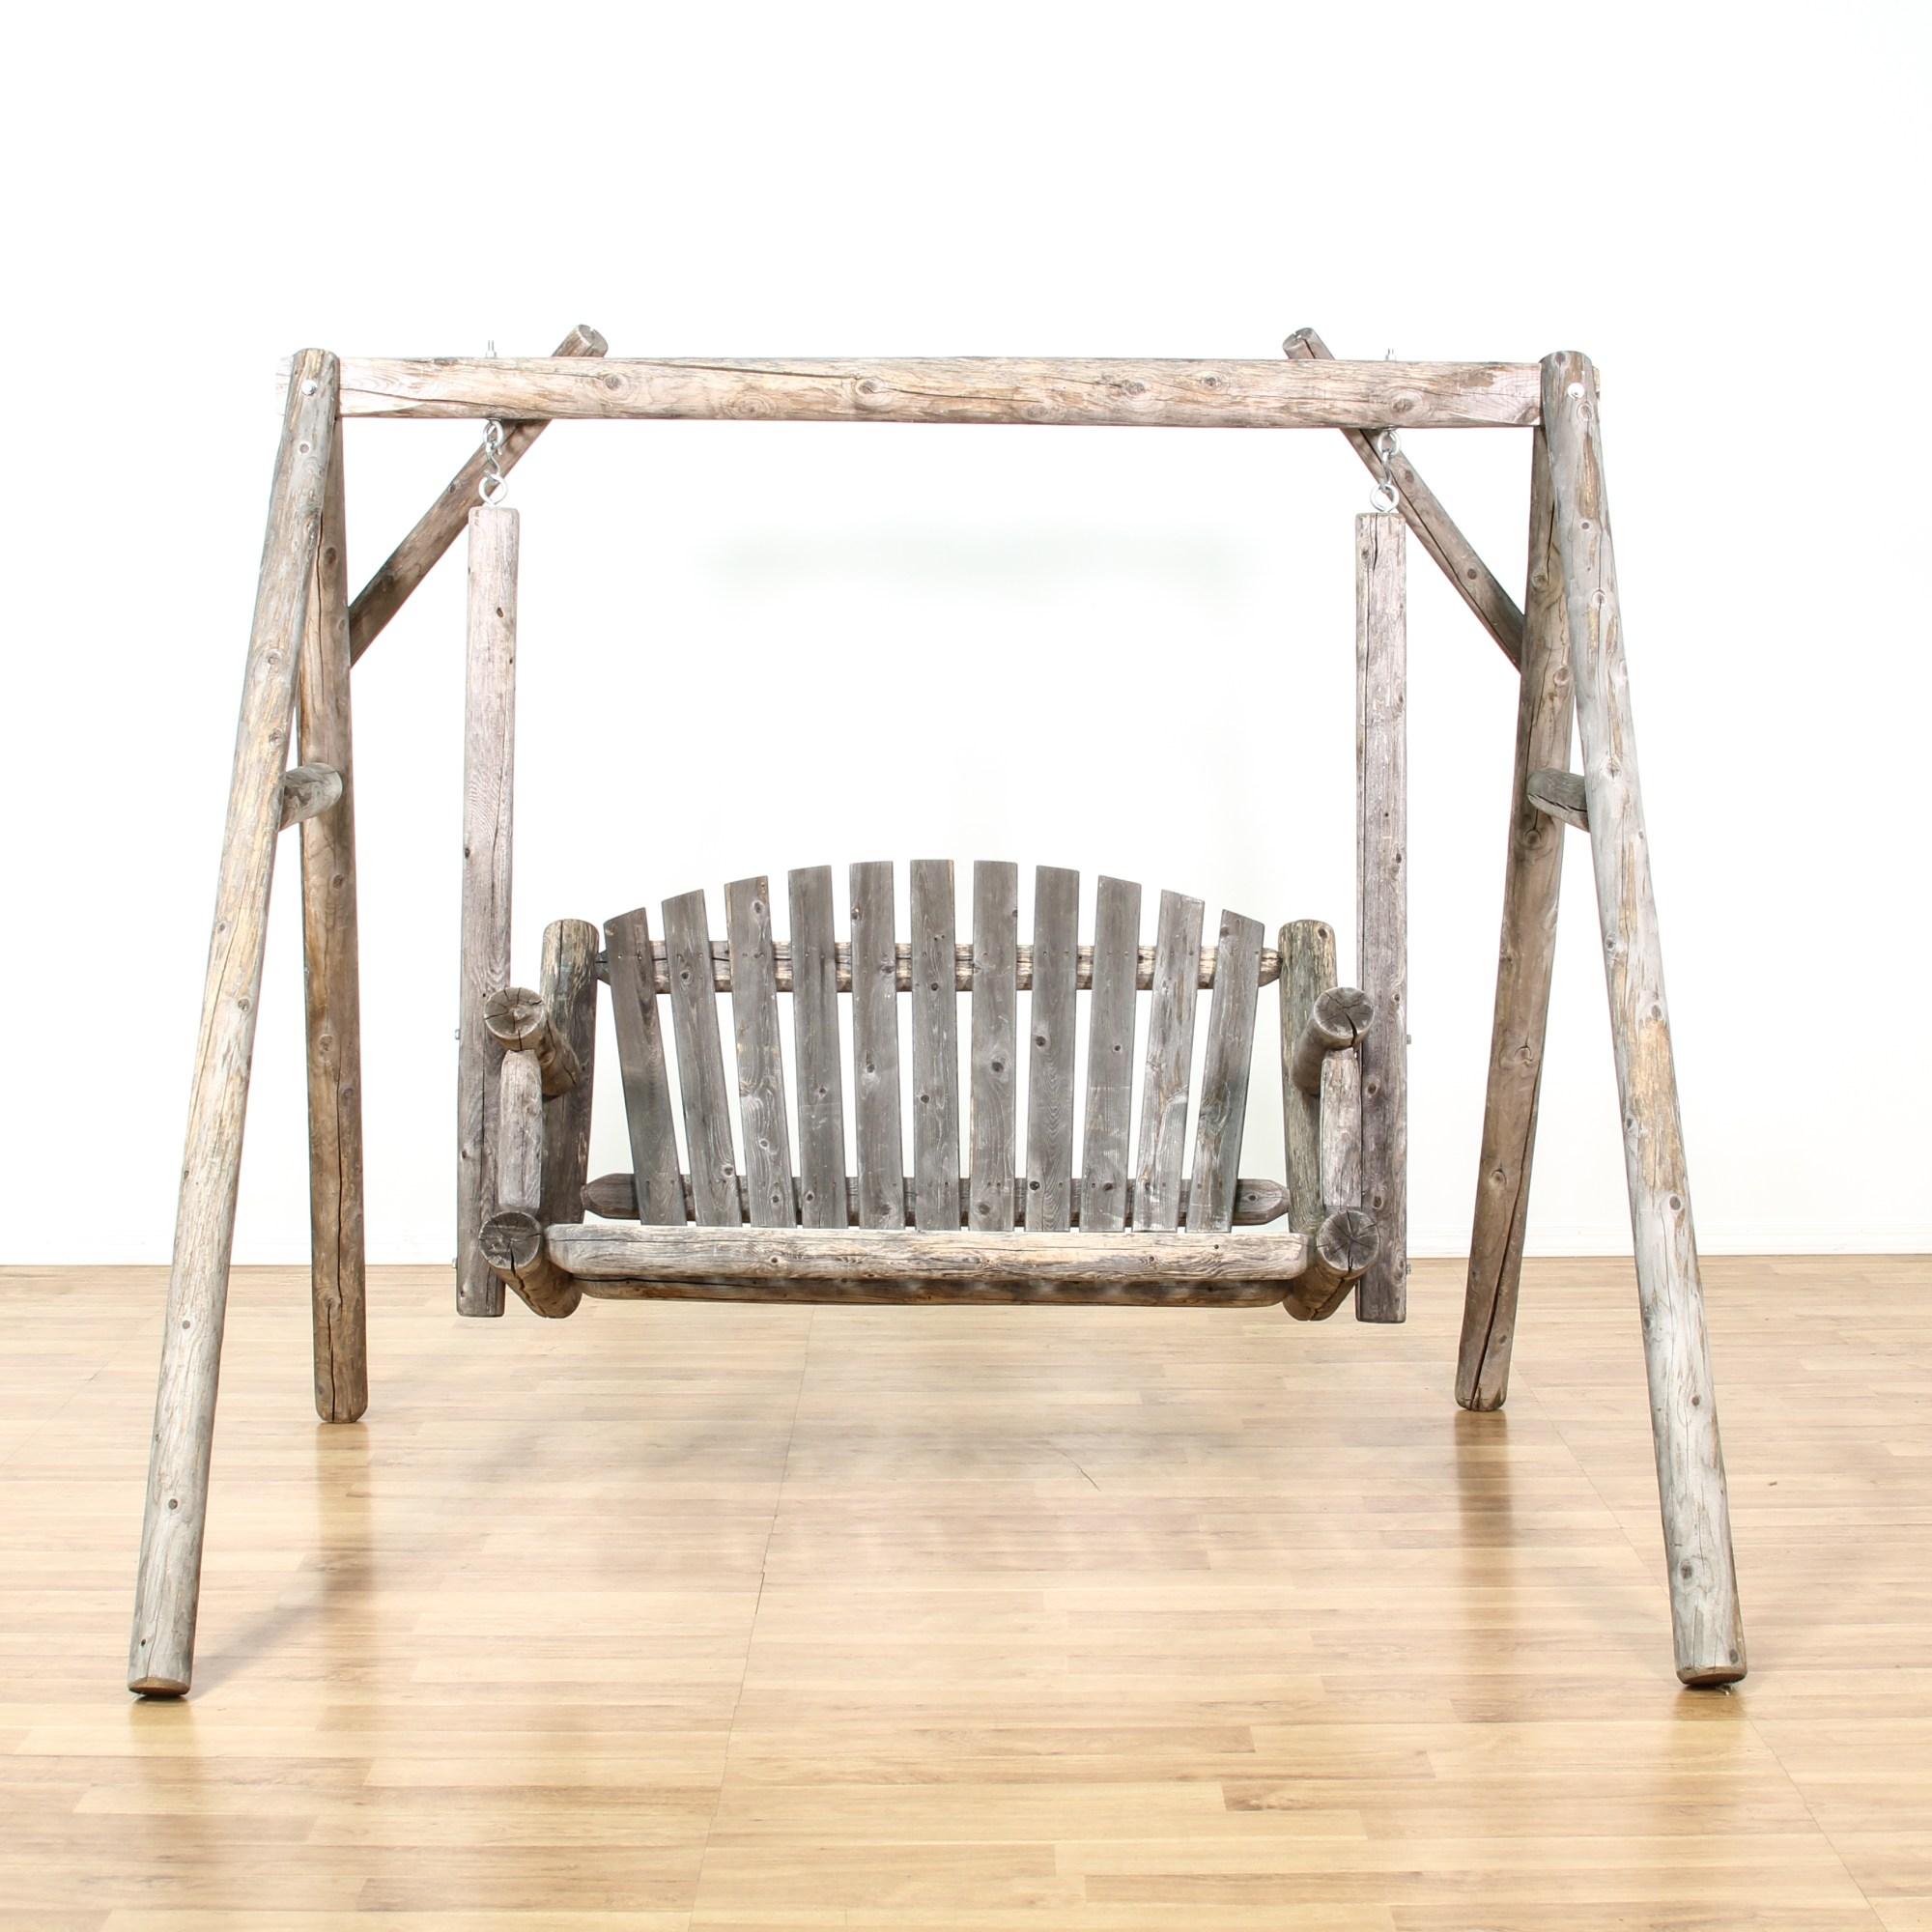 Rustic Raw Wood Outdoor Swing